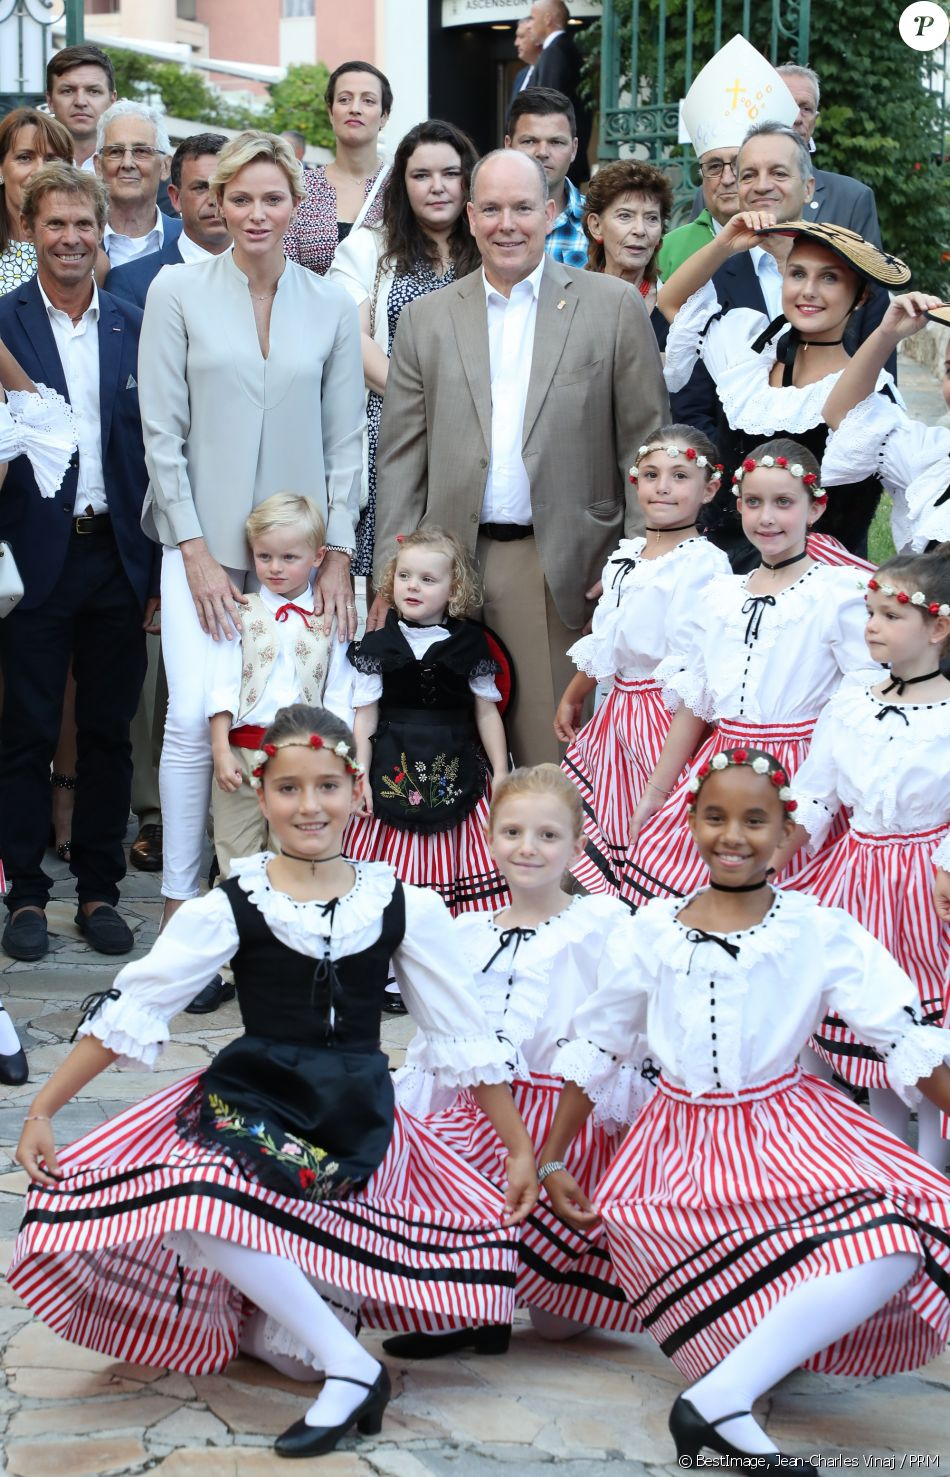 Alberto II y Charlene, Príncipes de Mónaco - Página 11 4280165-gareth-wittstock-et-sean-wittstock-frer-950x0-2